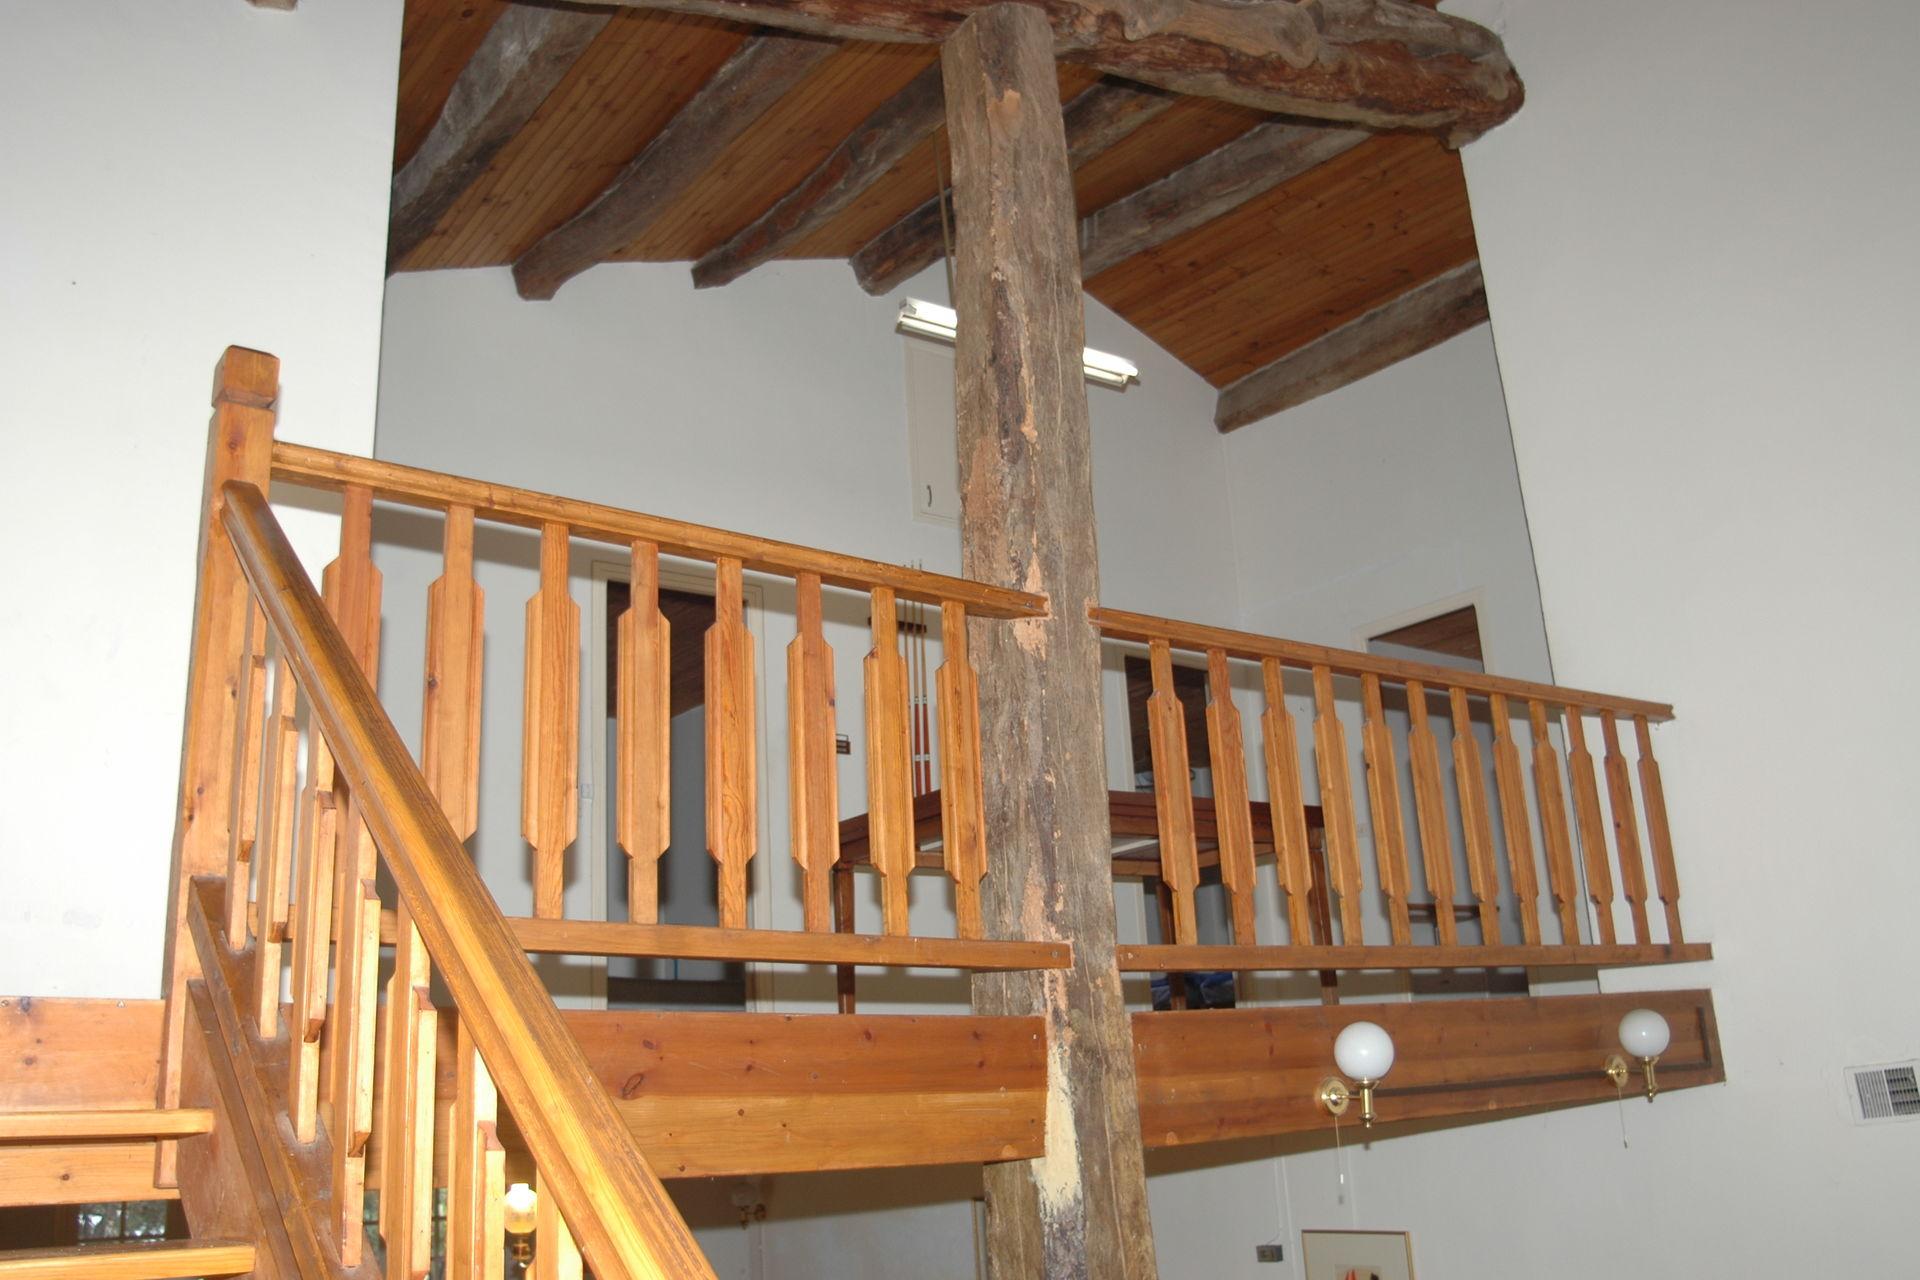 kaufe 39 l ndlich gelegenes haus 39 in languedoc roussillon. Black Bedroom Furniture Sets. Home Design Ideas